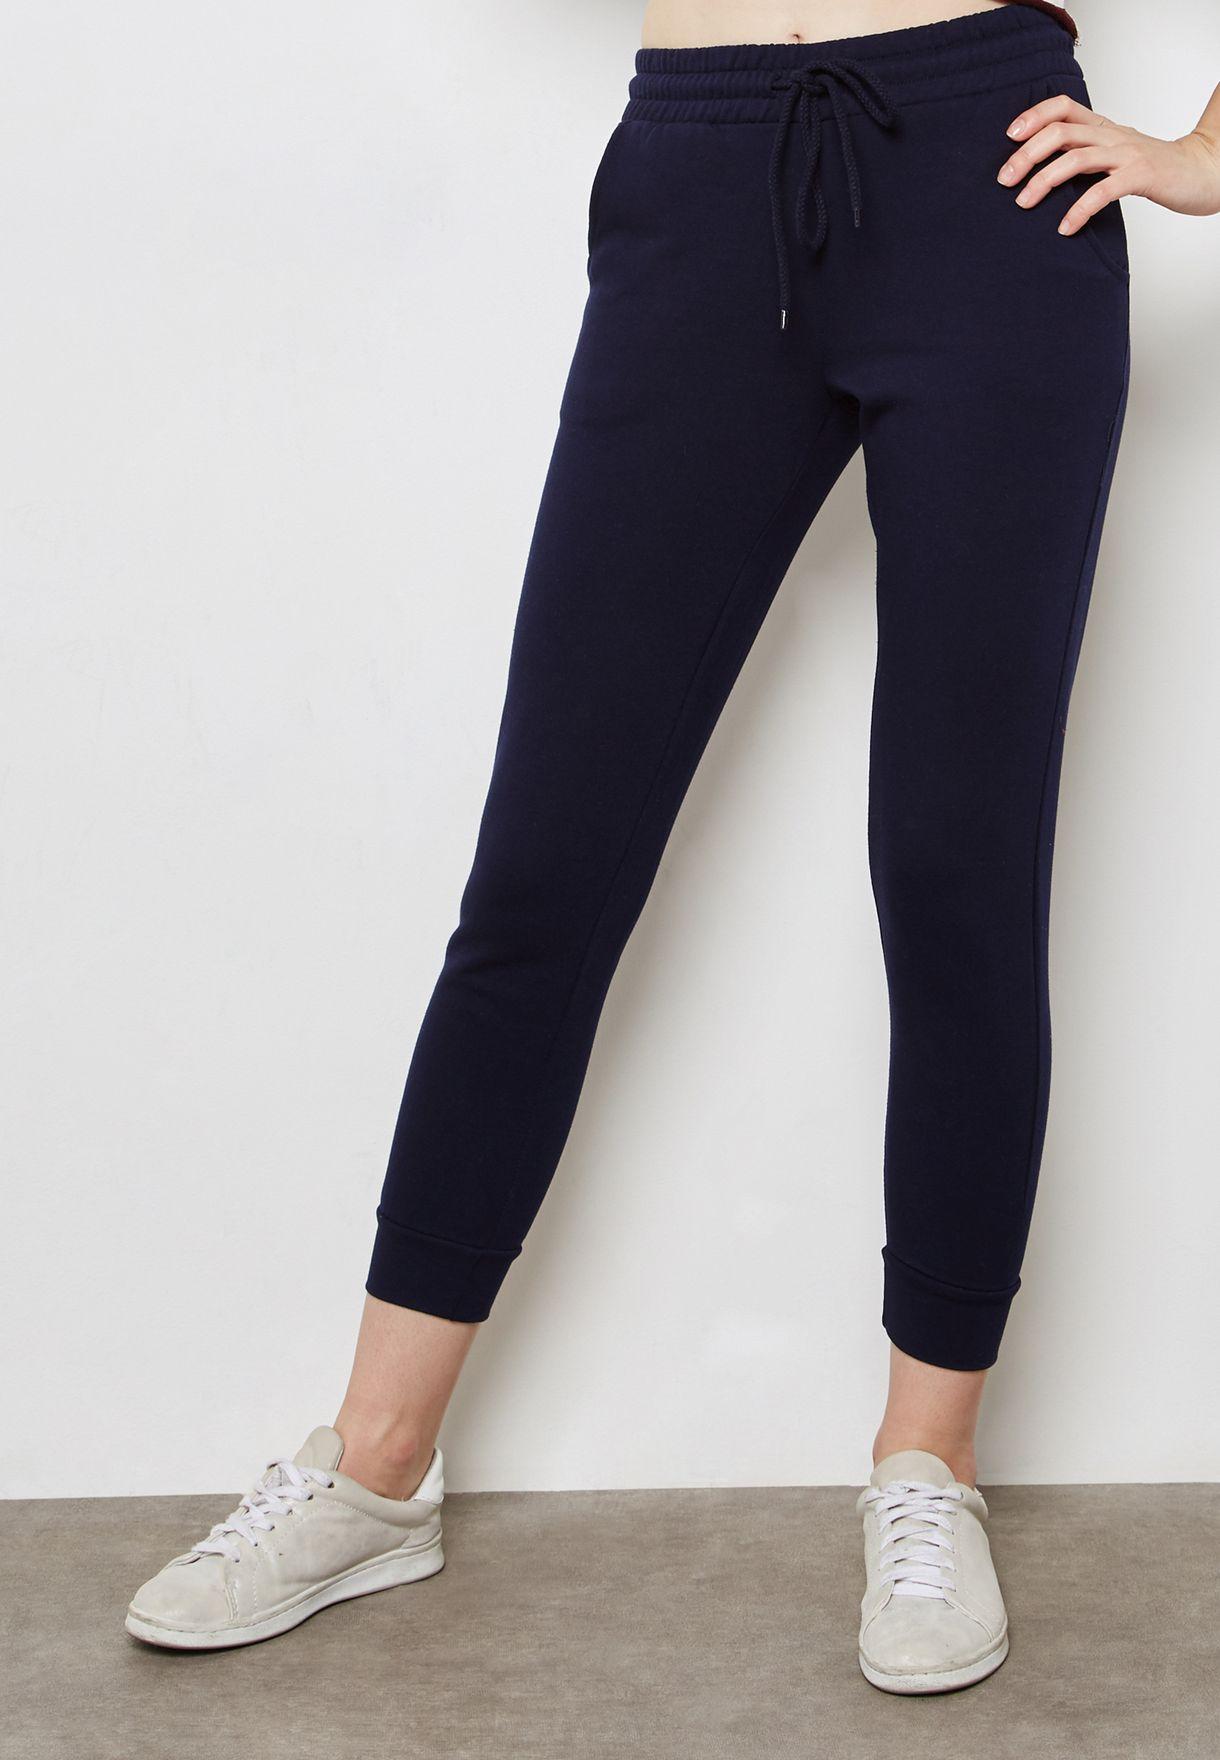 2e3d725a7d Shop Forever 21 navy Tie Waist Pants 144819 for Women in Kuwait ...